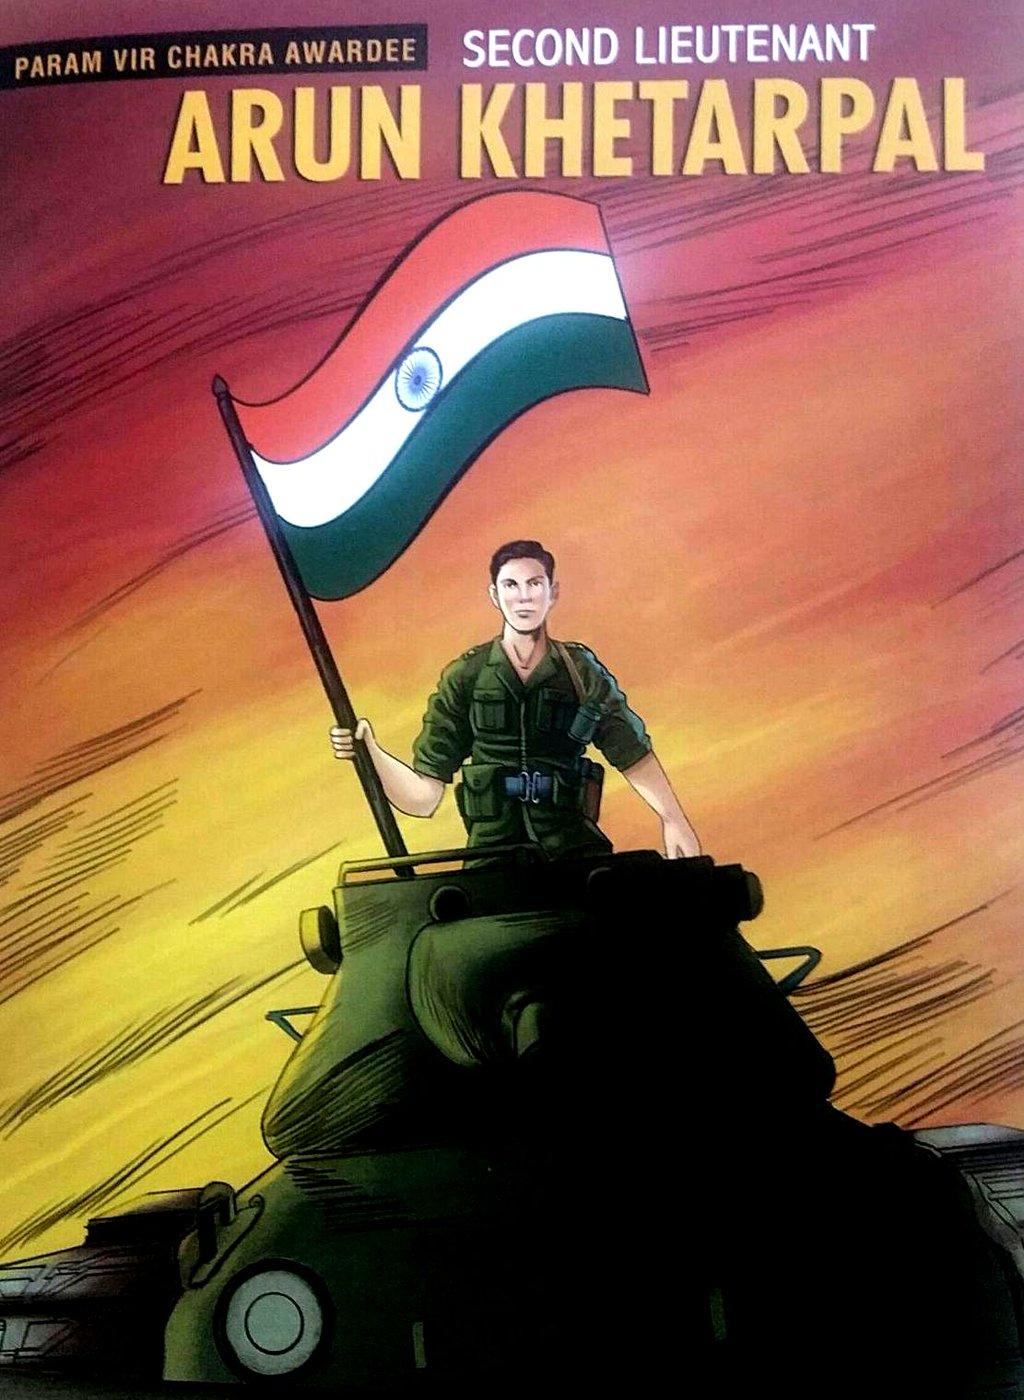 Second Lt. Arun Khetarpal